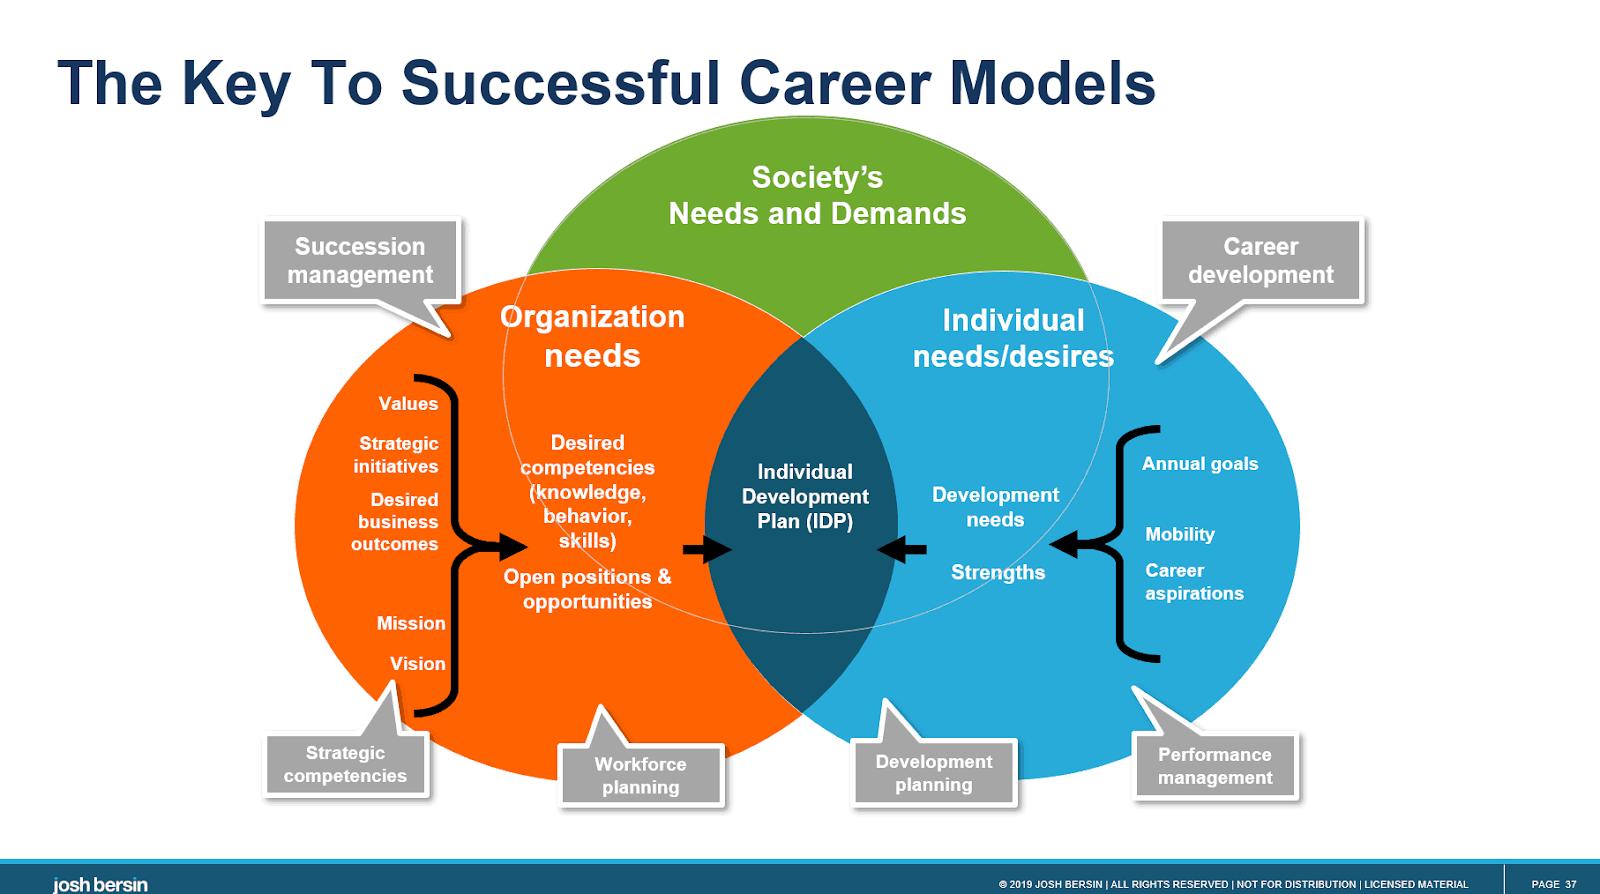 Bersin's Key to Successful Career Models